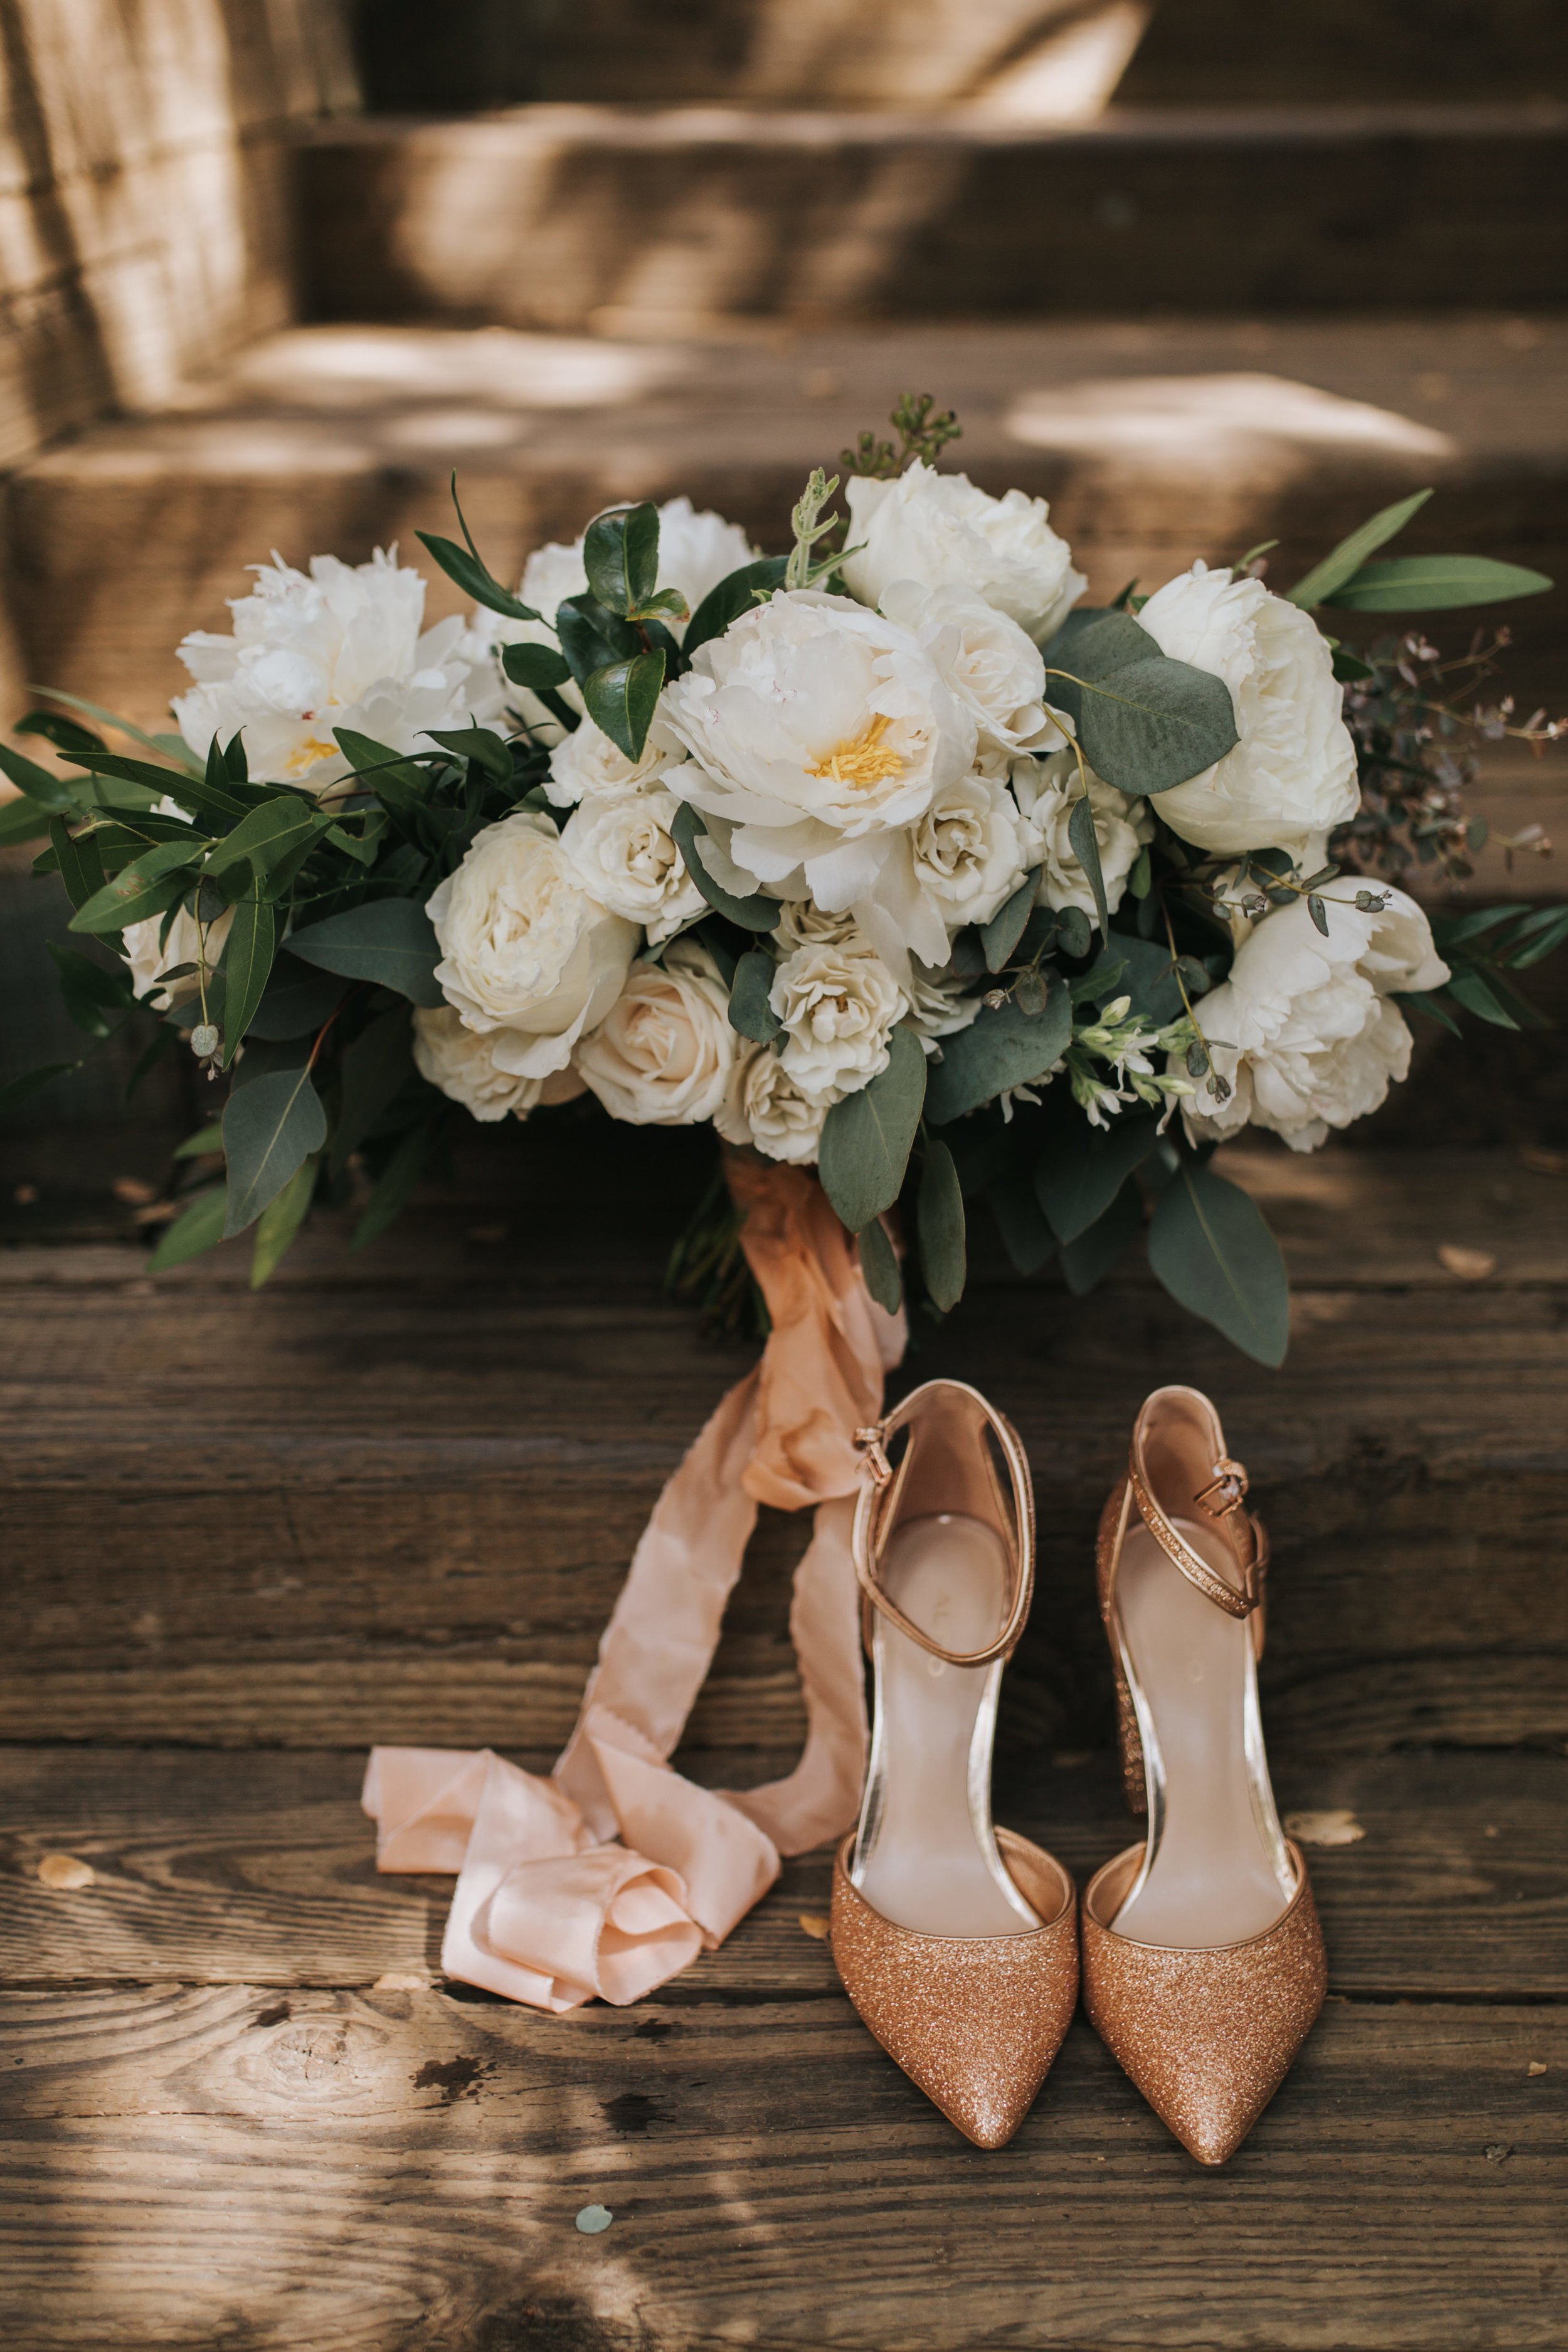 The 1909, The 1909 Wedding, Topanga Canyon Wedding, white peony bridal bouquet, eucalyptus bridal bouquet, peach silk ribbon, blush silk ribbon, blush glitter wedding shoes, white spray rose bouquet